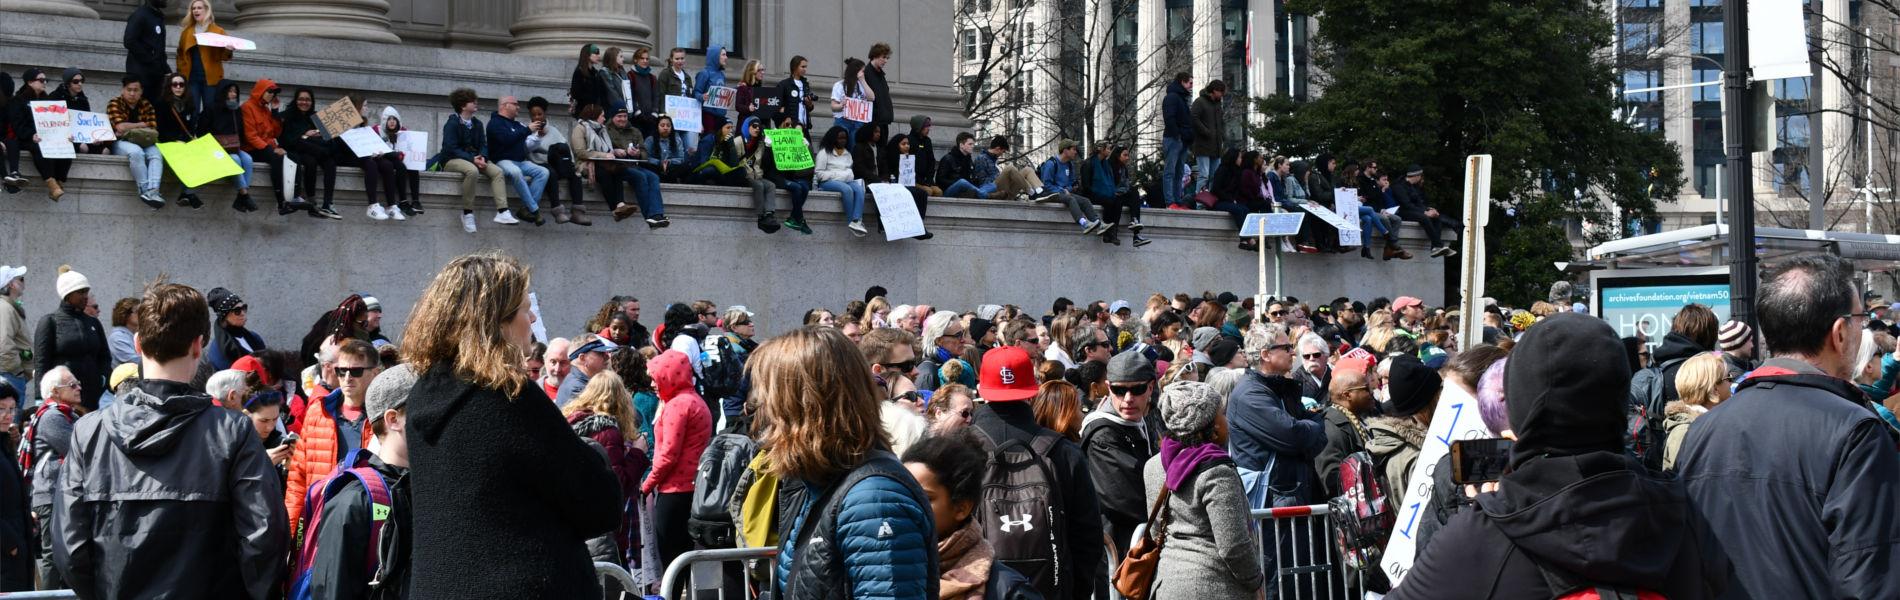 firearm merchant accounts closed protests